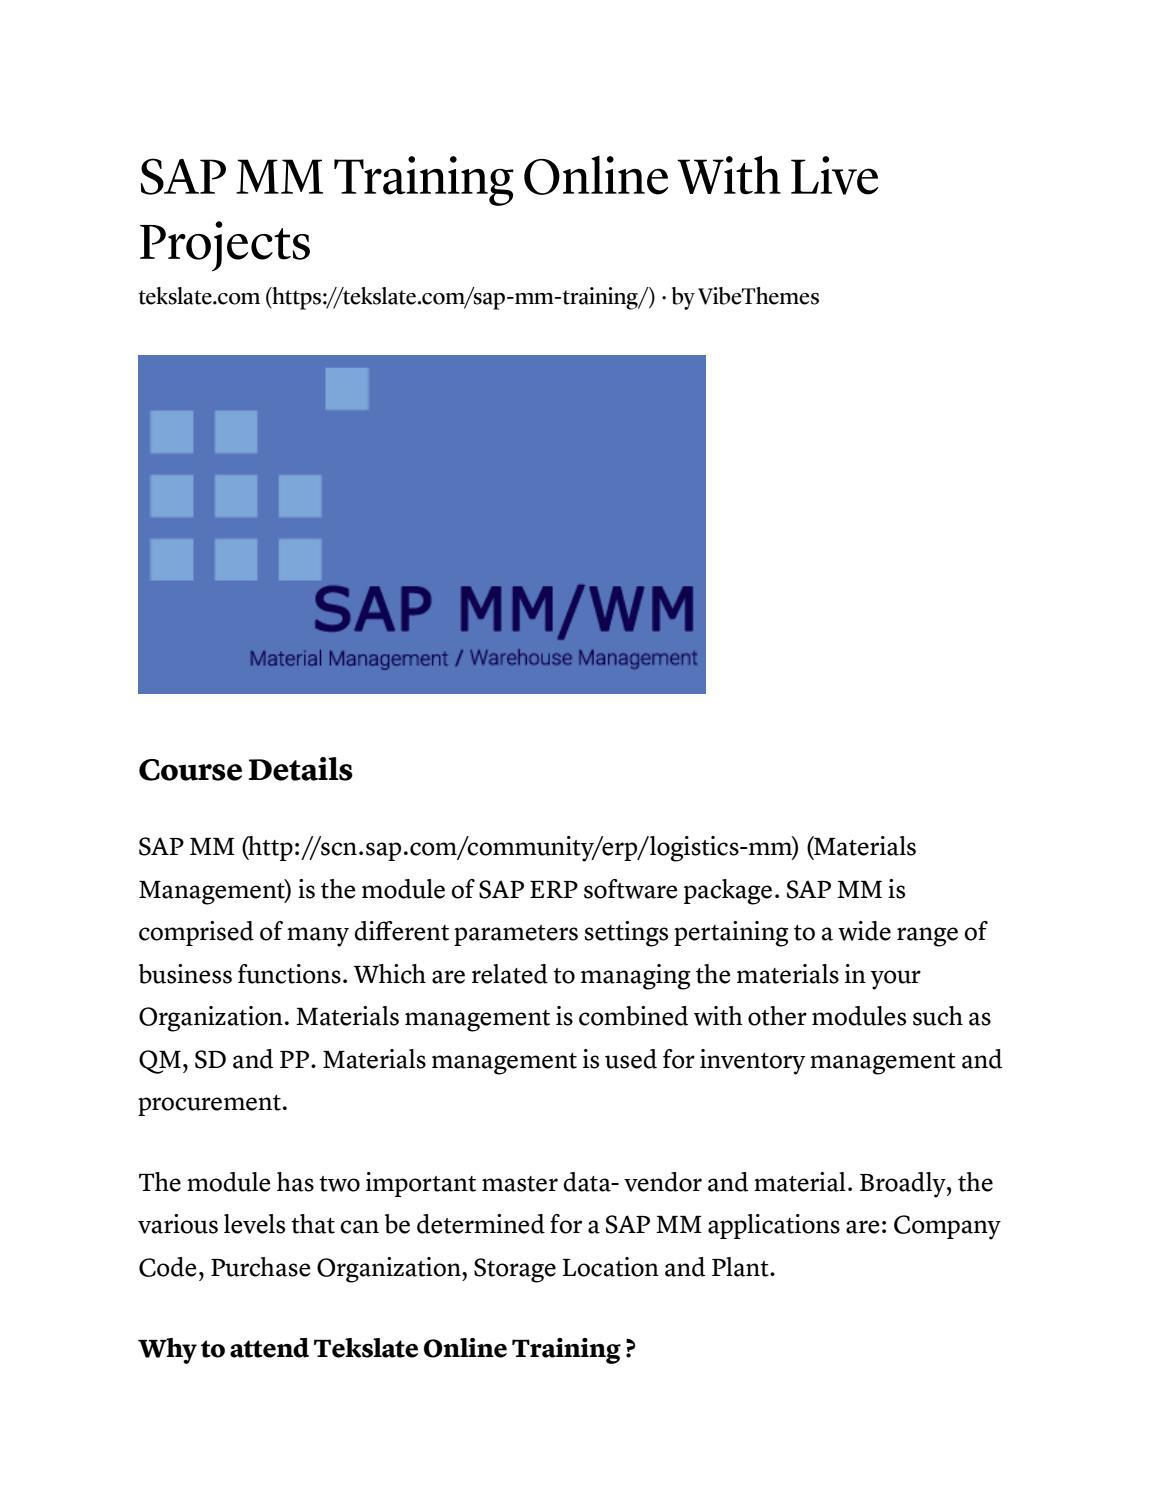 Sap mm training by Tekslate - issuu